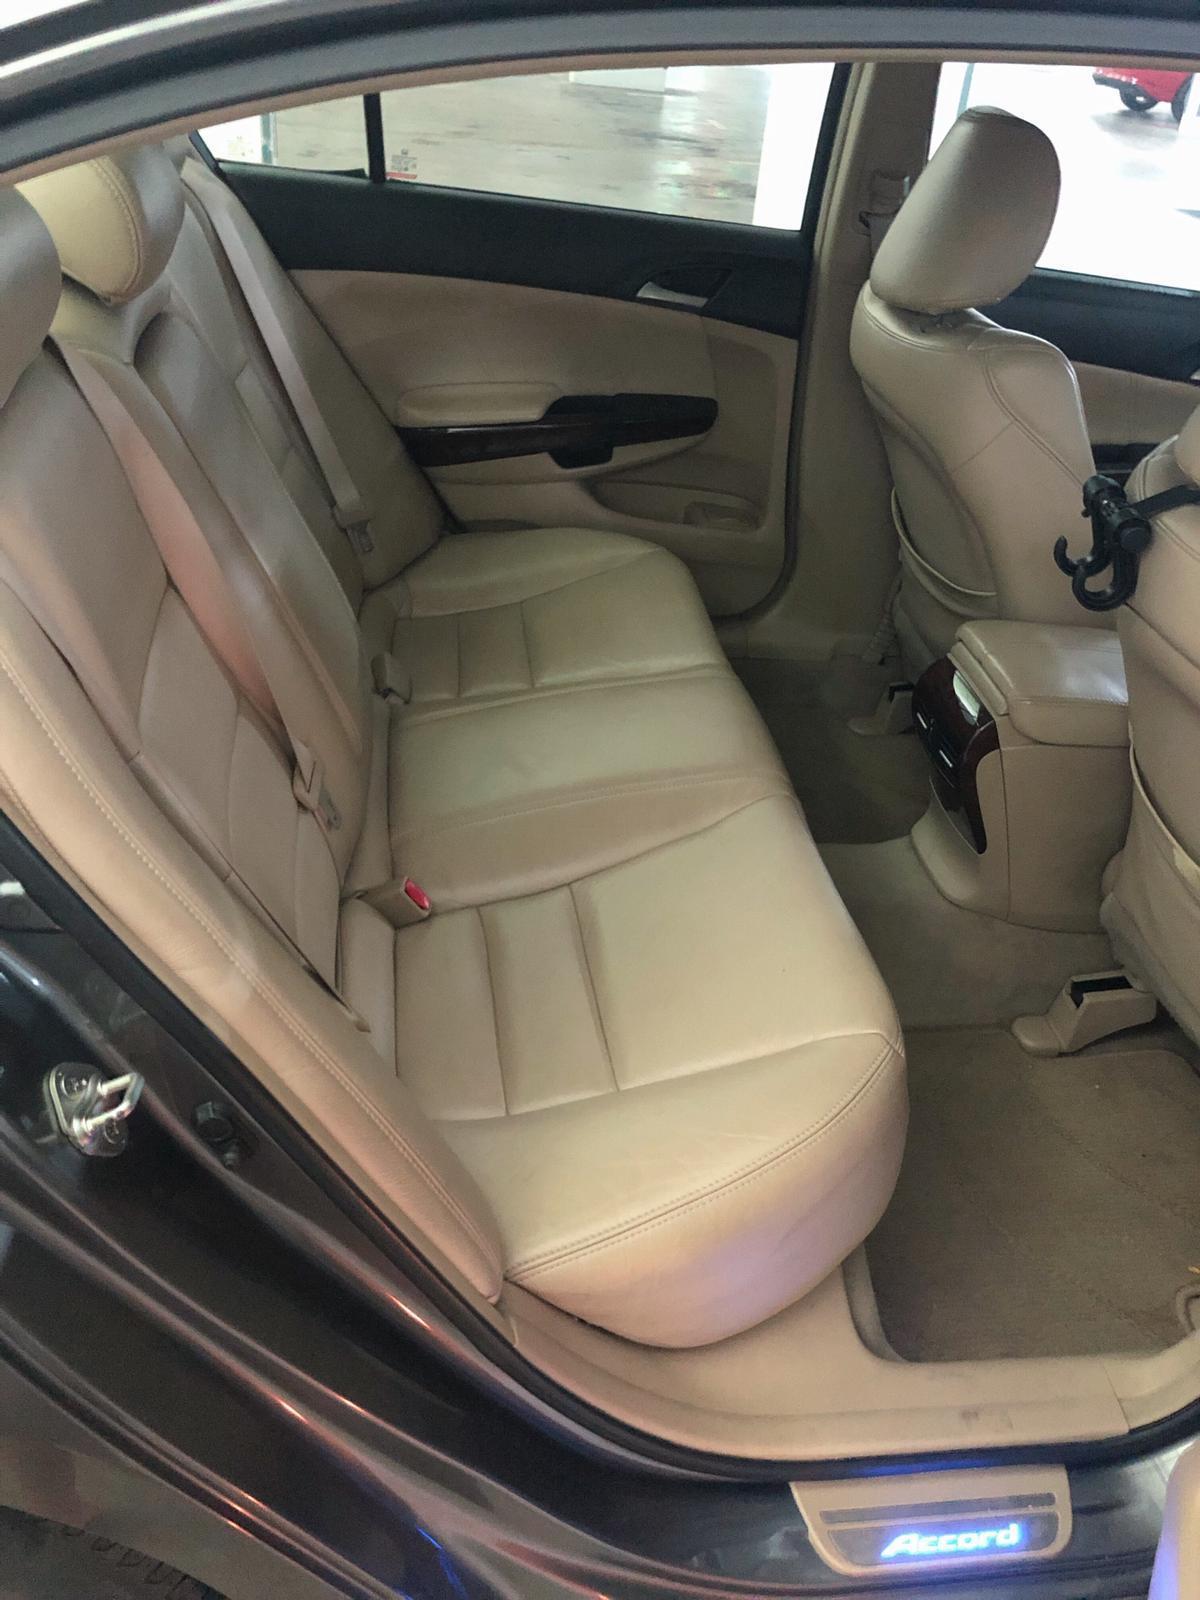 Honda Accord CHEAPEST CAR RENTAL for Grab GoJek or Personal use